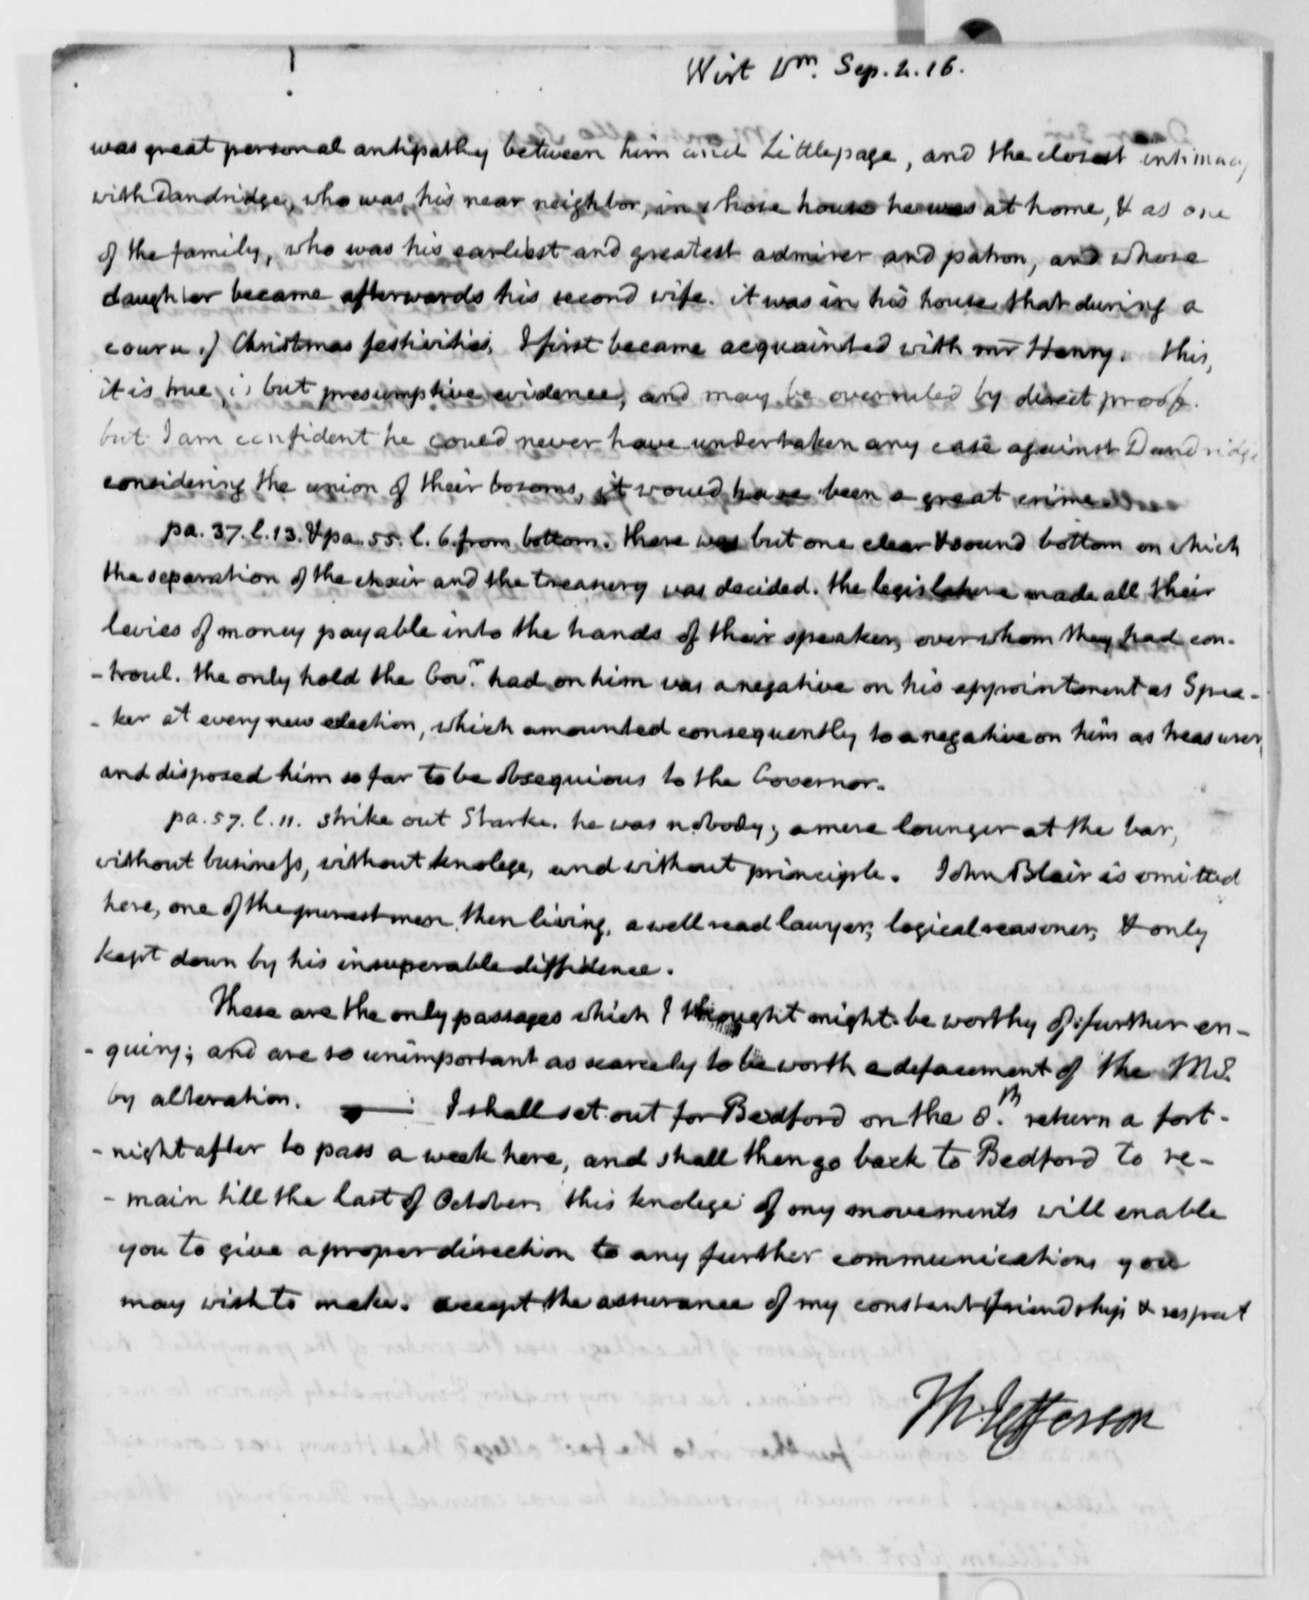 Thomas Jefferson to William Wirt, September 4, 1816